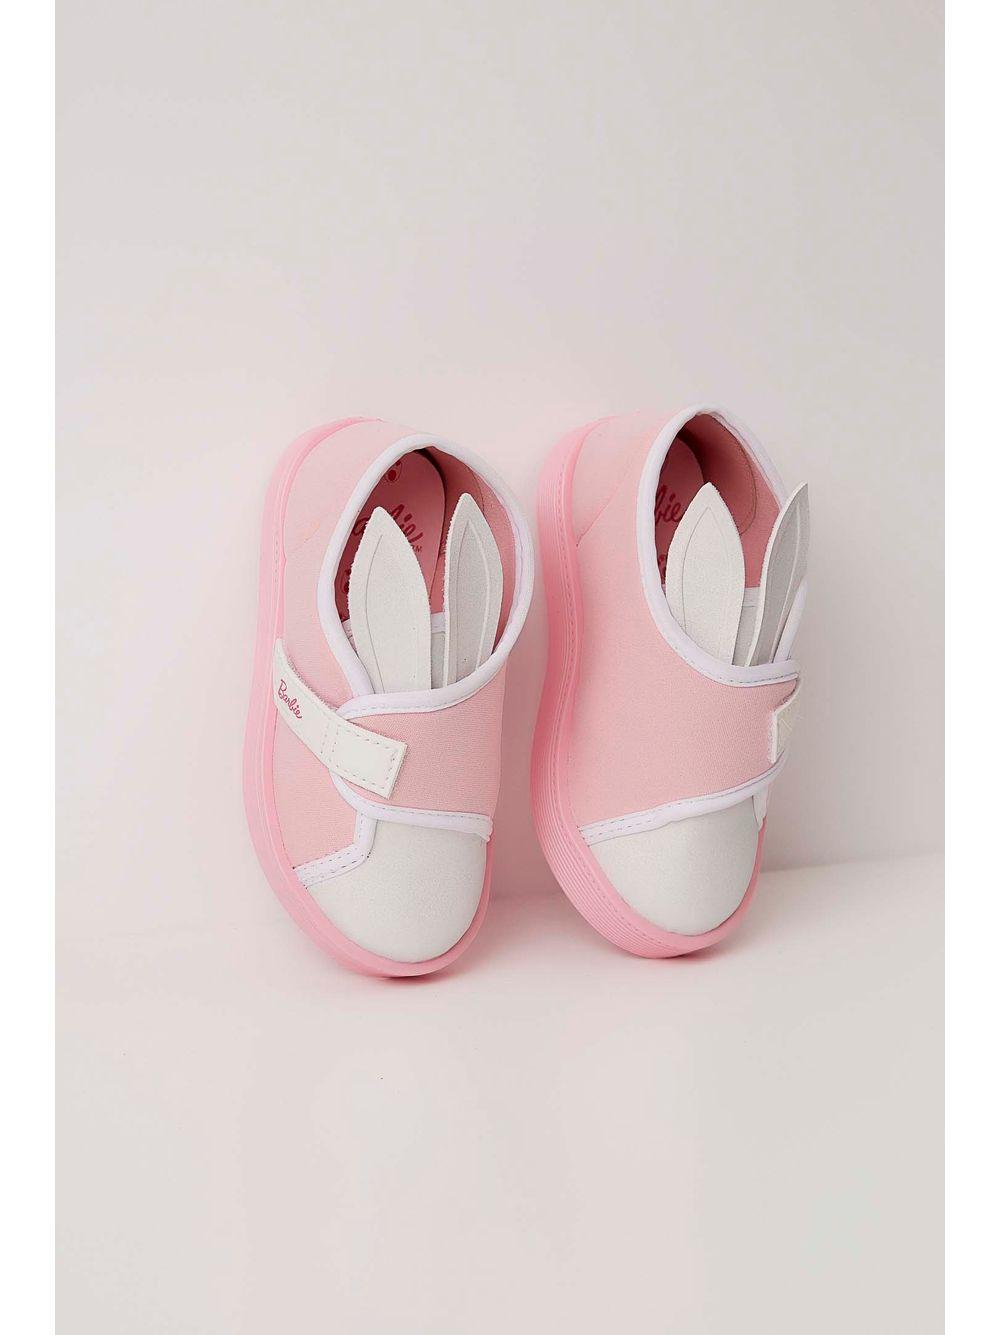 29902cf75 Tênis Grendene Barbie Fashion Pets Infantil Menina Rosa - pittol